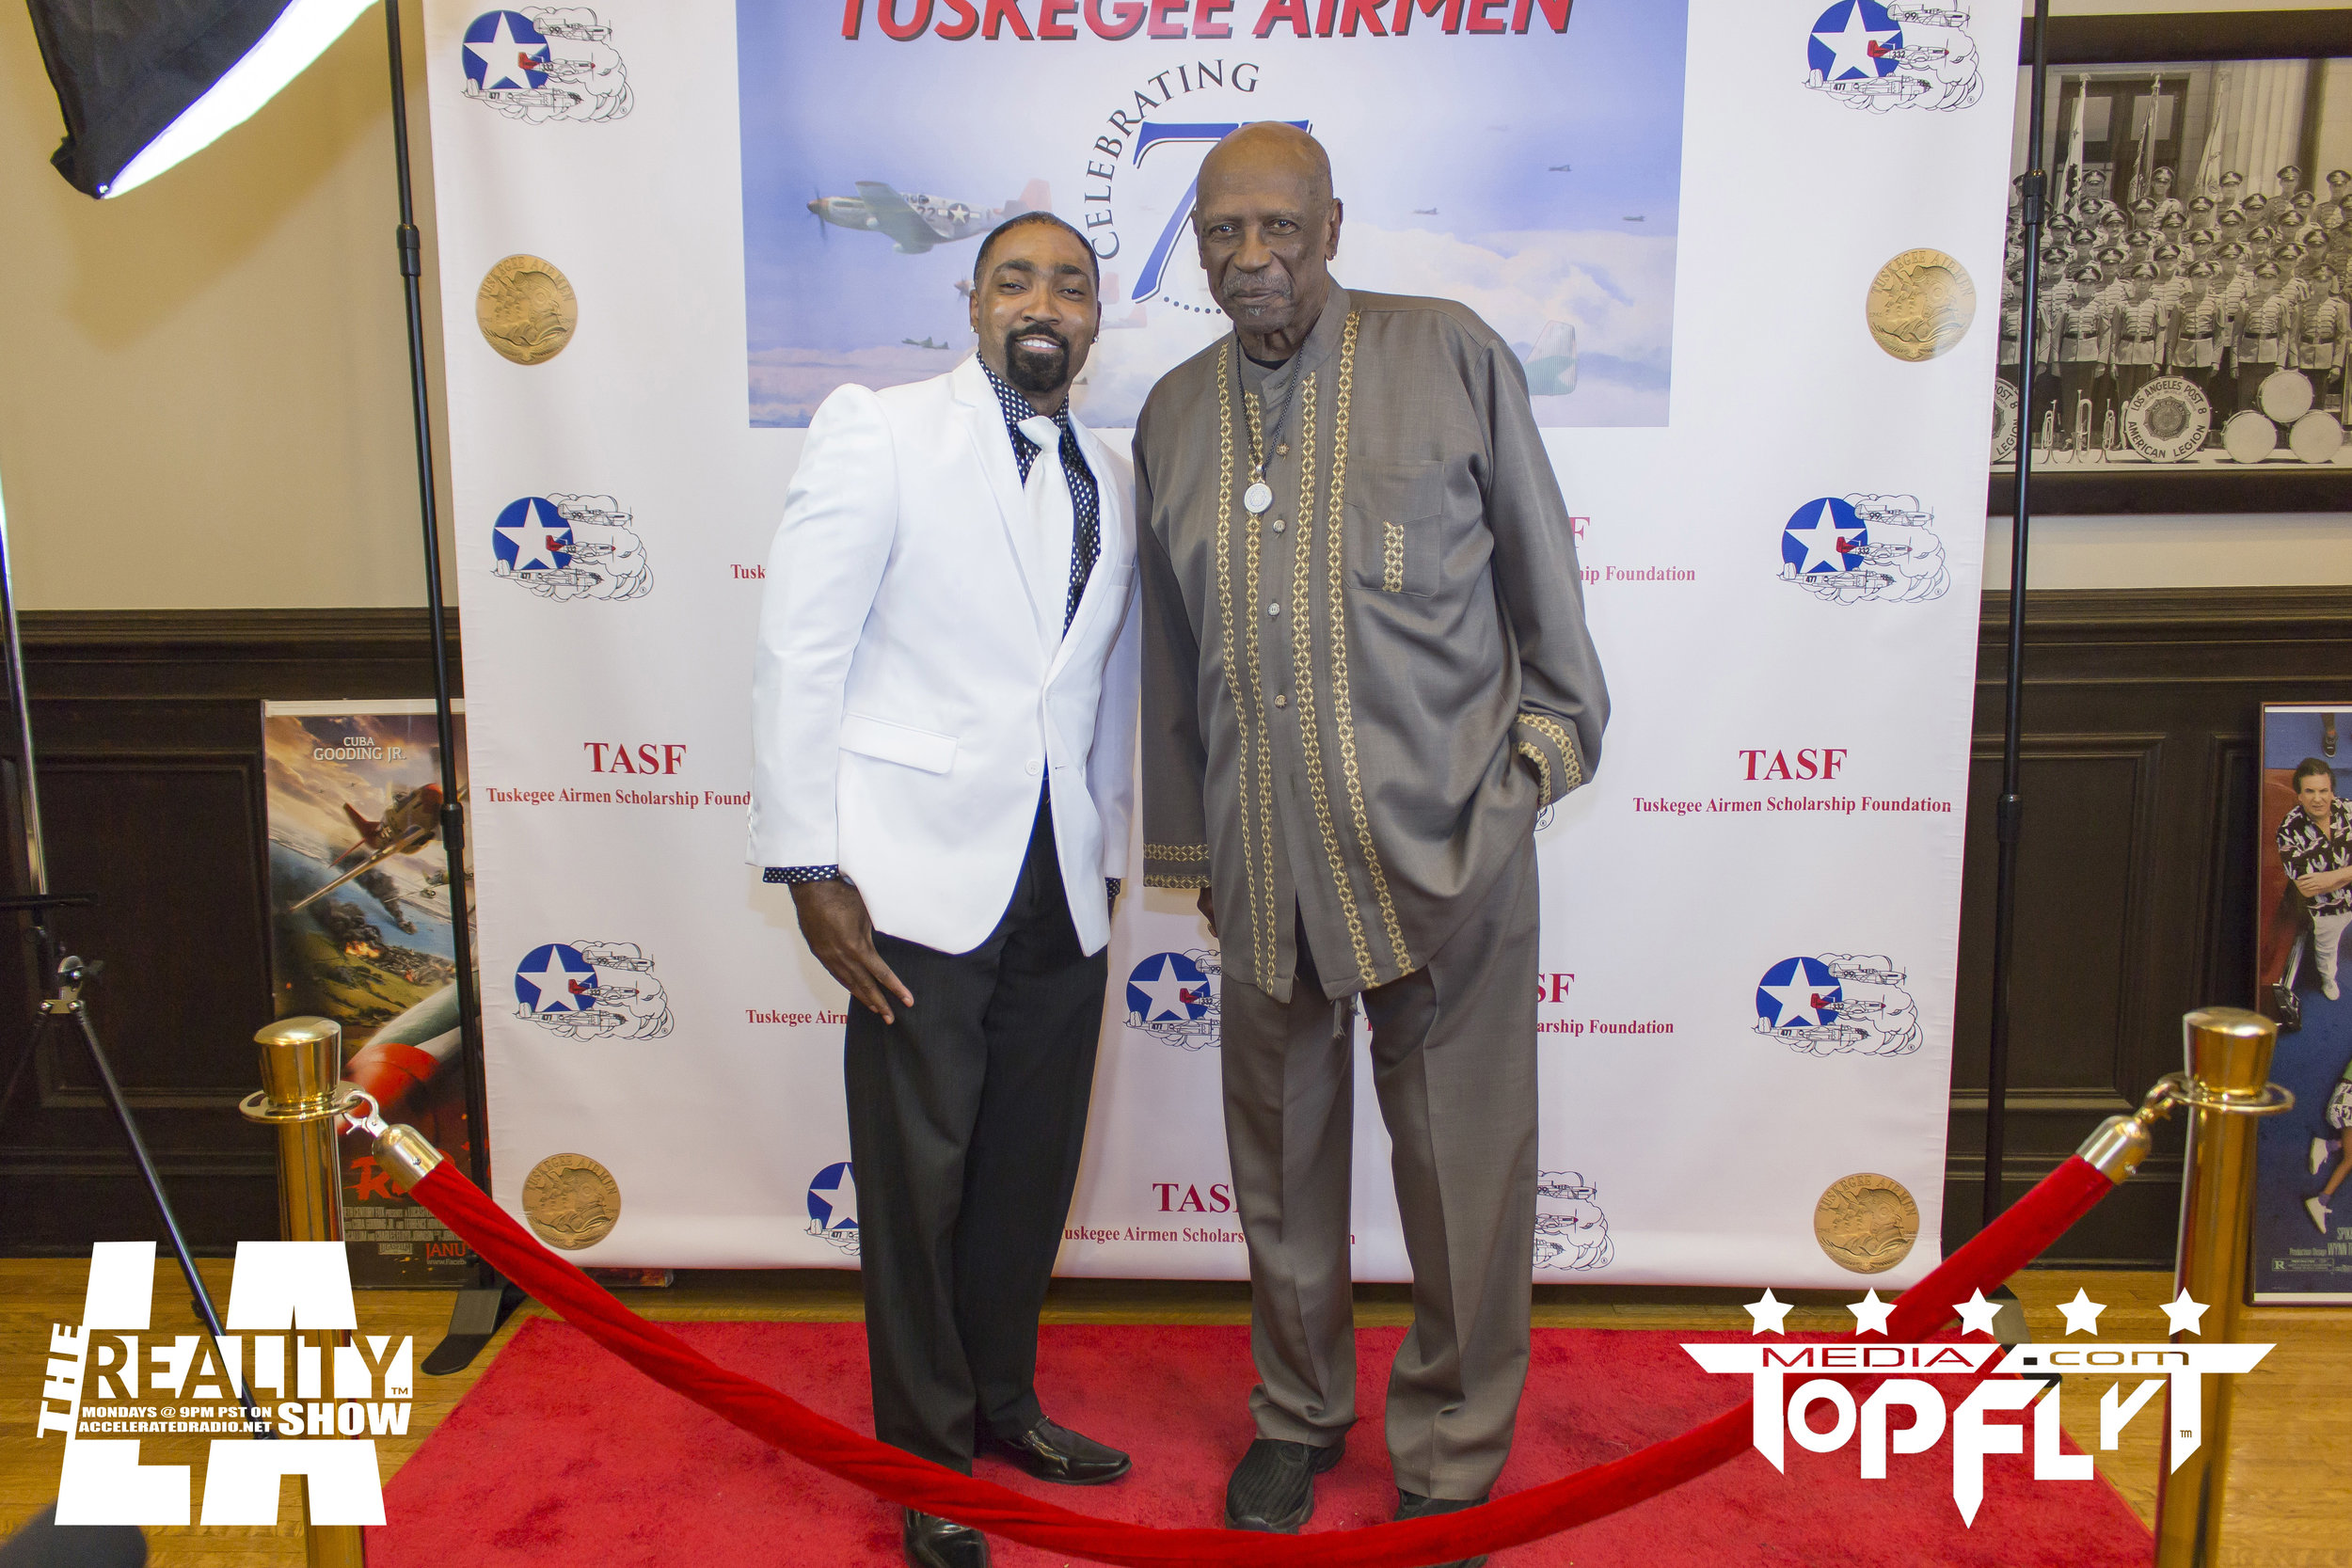 The Reality Show LA - Tuskegee Airmen 75th Anniversary VIP Reception_73.jpg